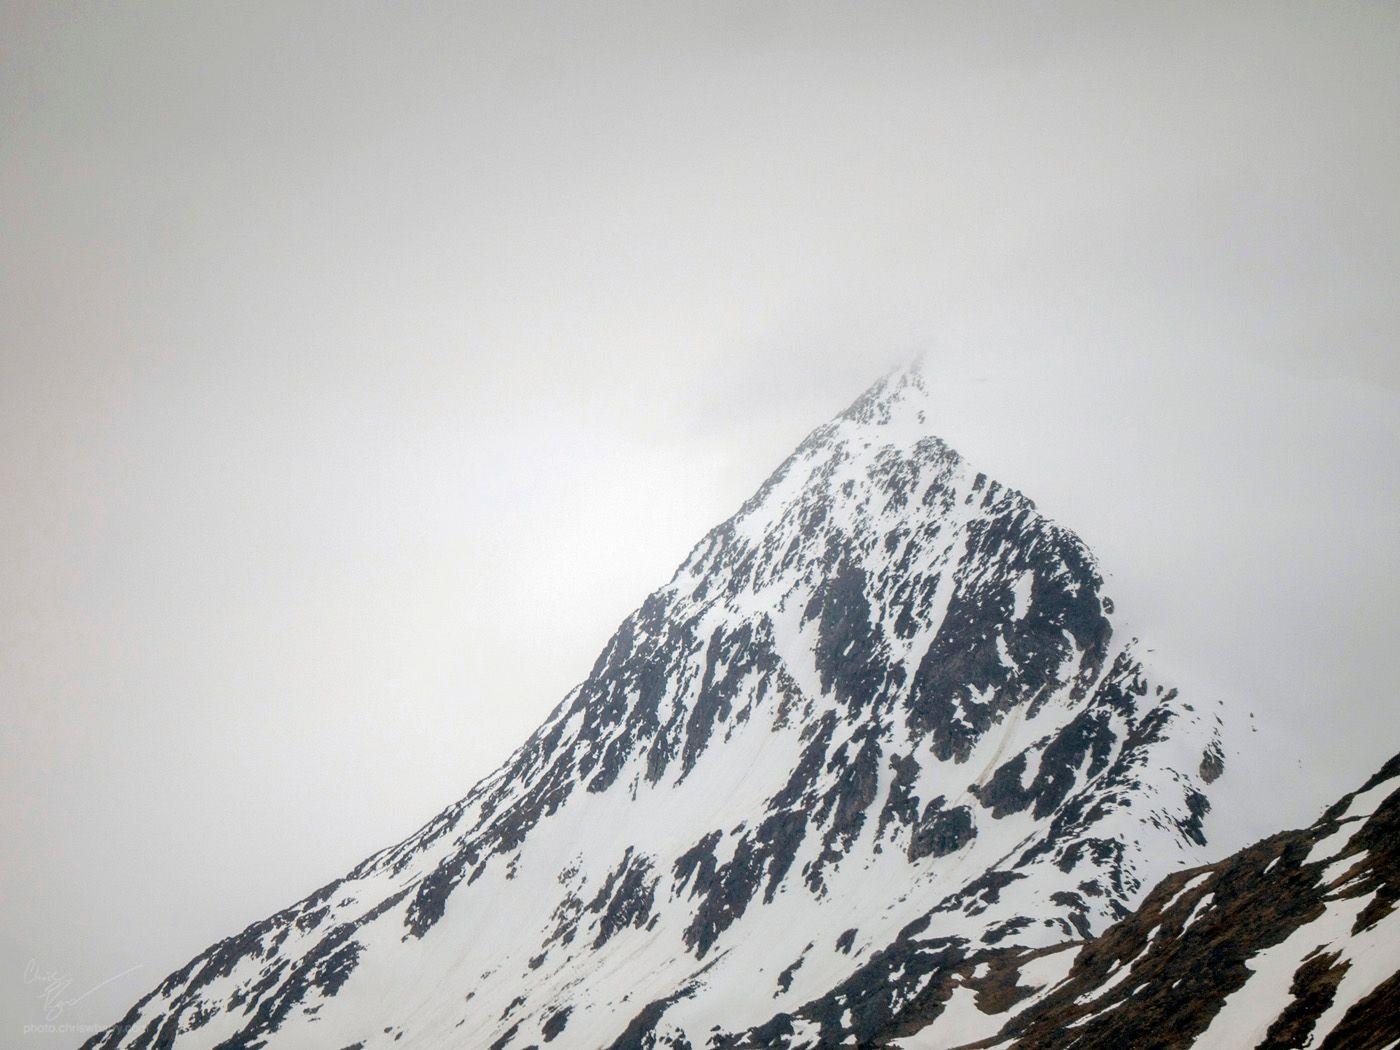 6-04-18: Snowy Mountain